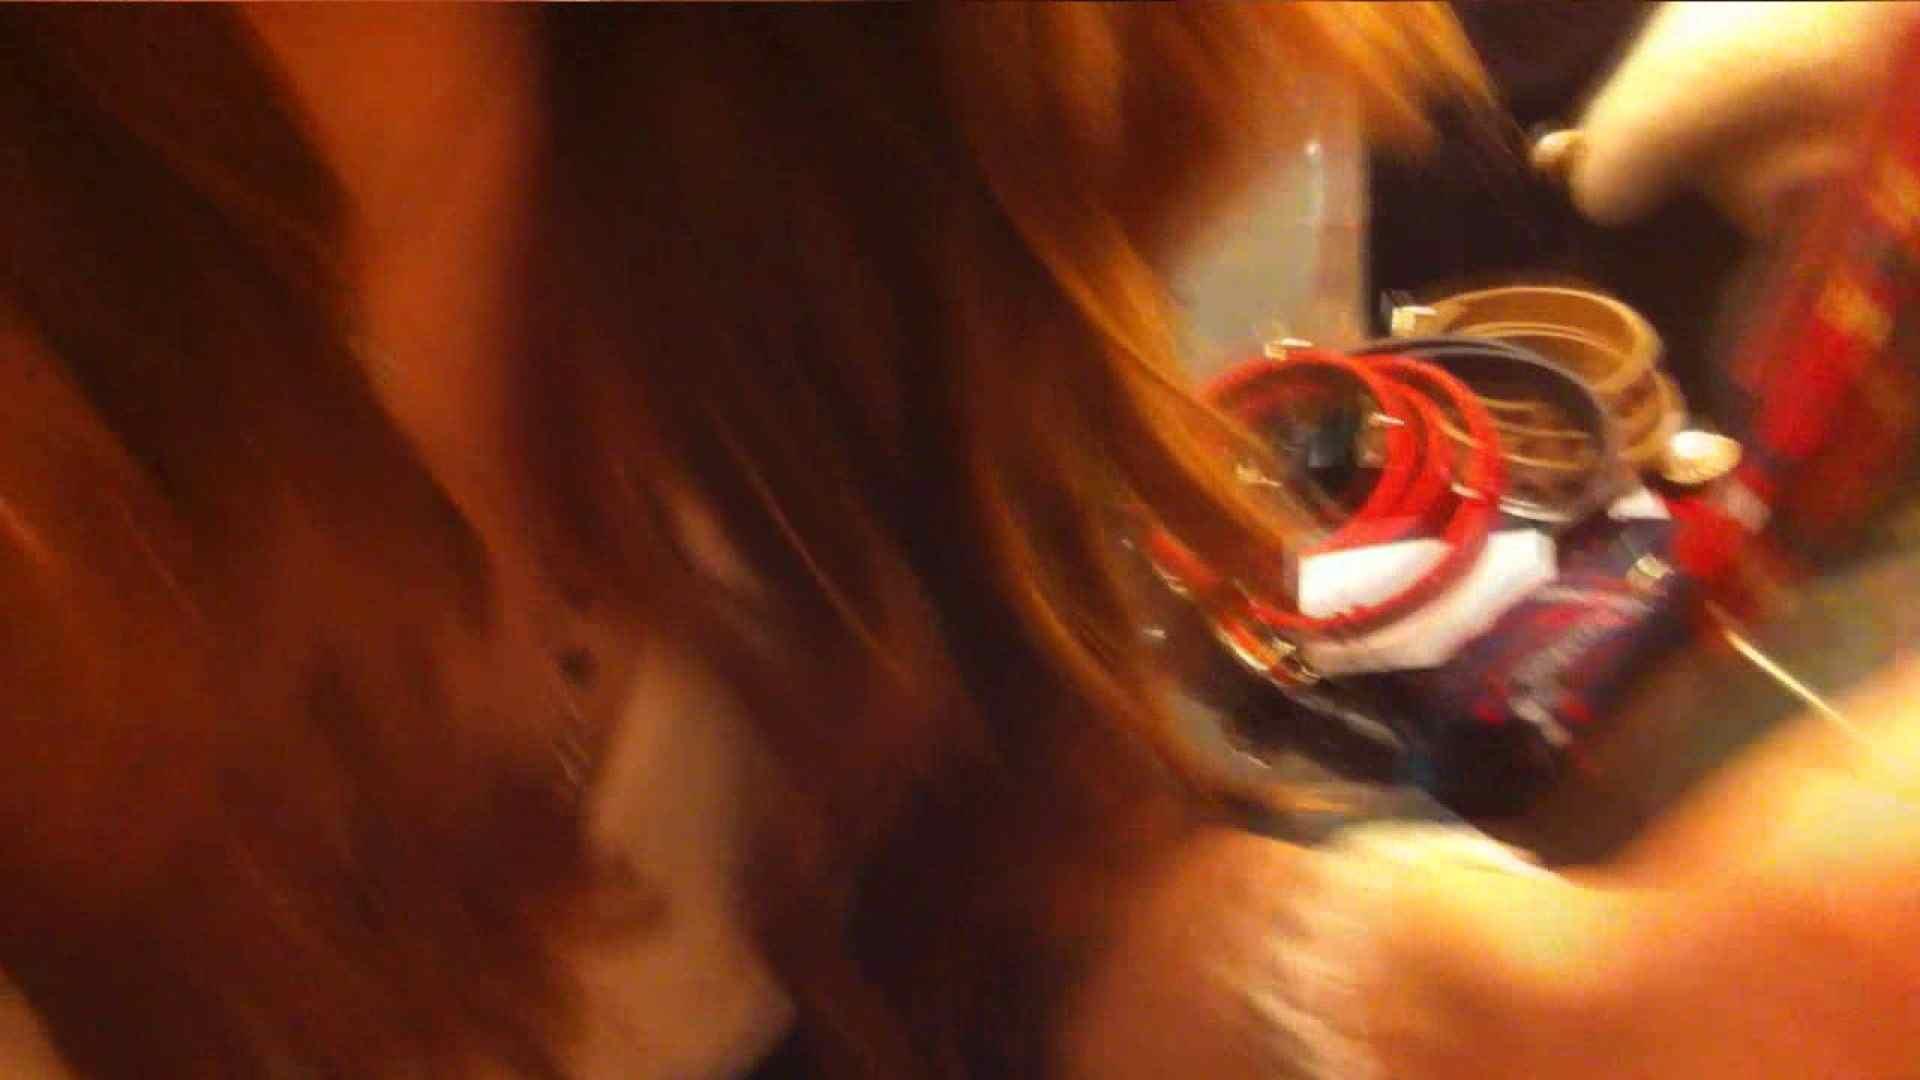 vol.35 美人アパレル胸チラ&パンチラ ひらひらスカートの中身は? 接写 盗撮われめAV動画紹介 108画像 103